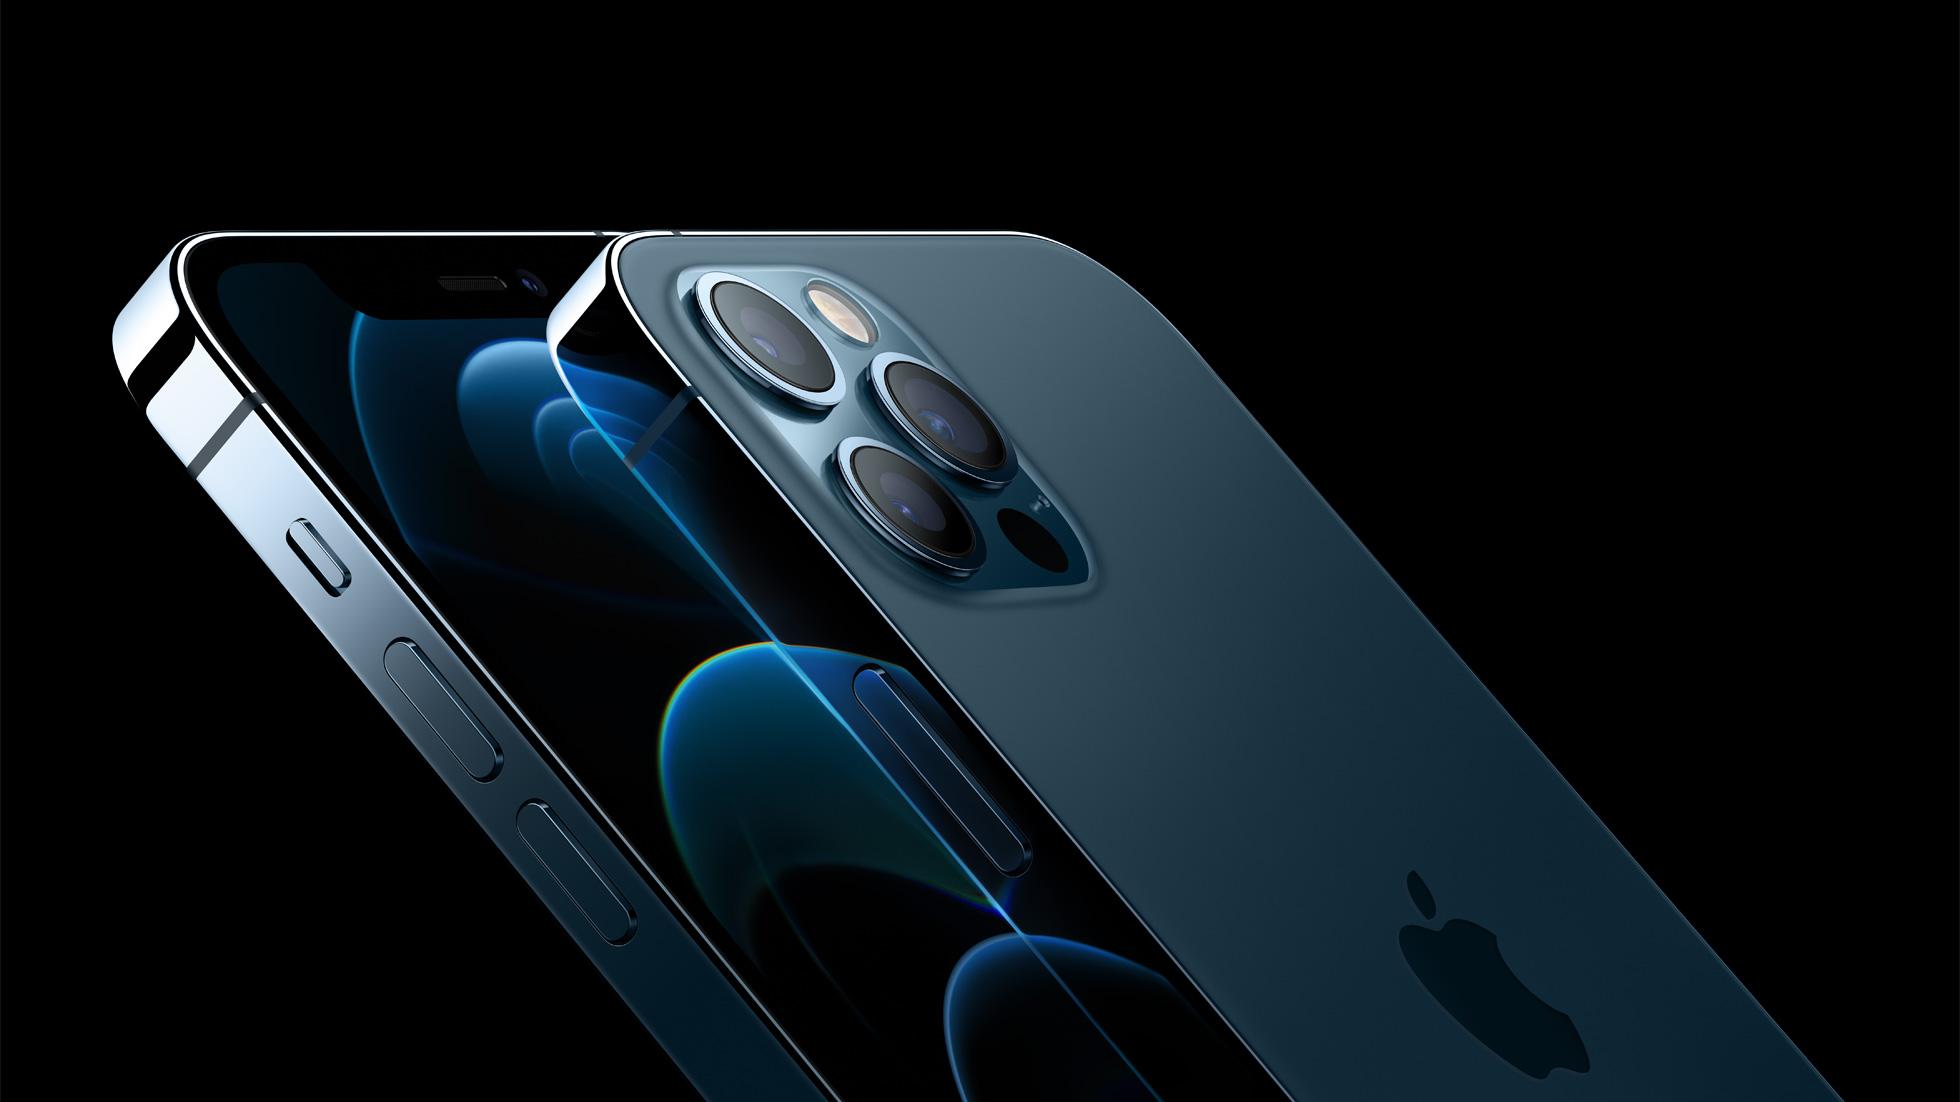 iPhone 12 Pro и 12 Pro Max - представлены новые флагманы Apple - ITC.ua